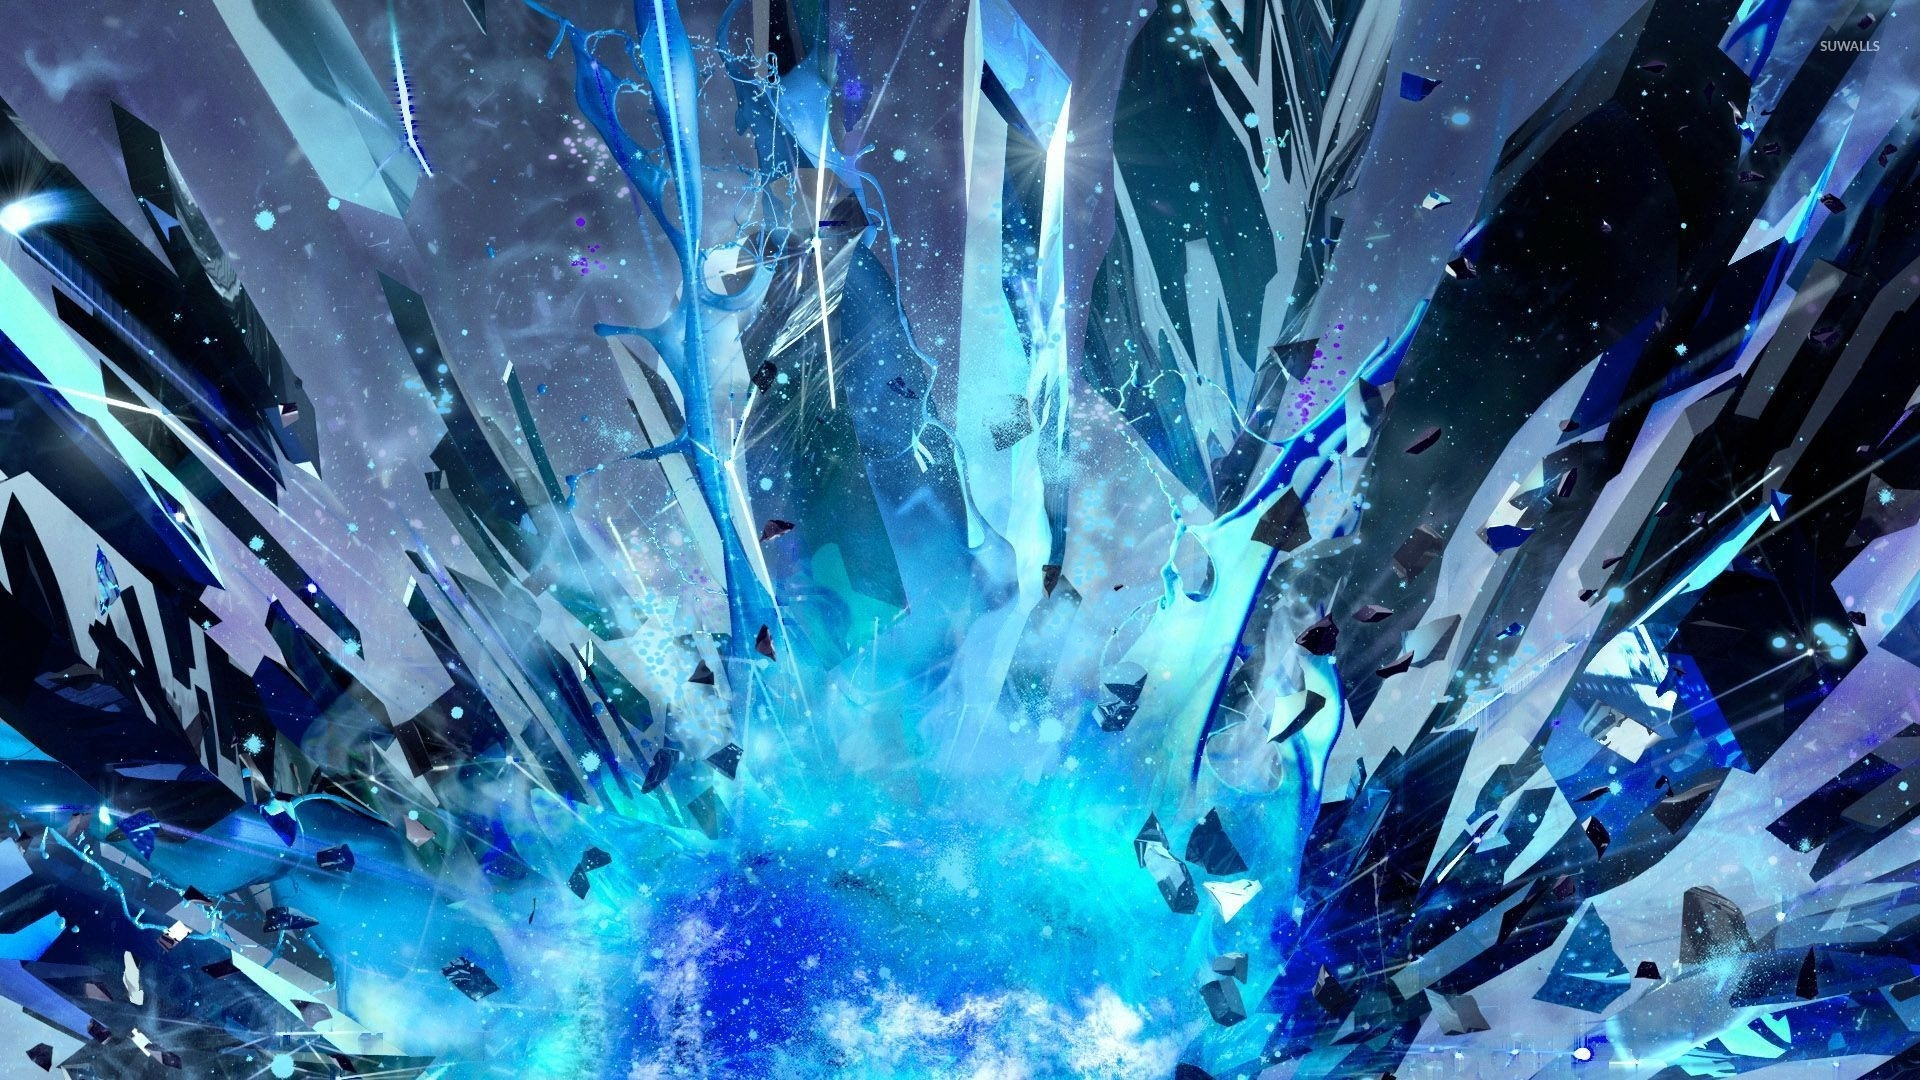 Crystals Desktop Wallpaper